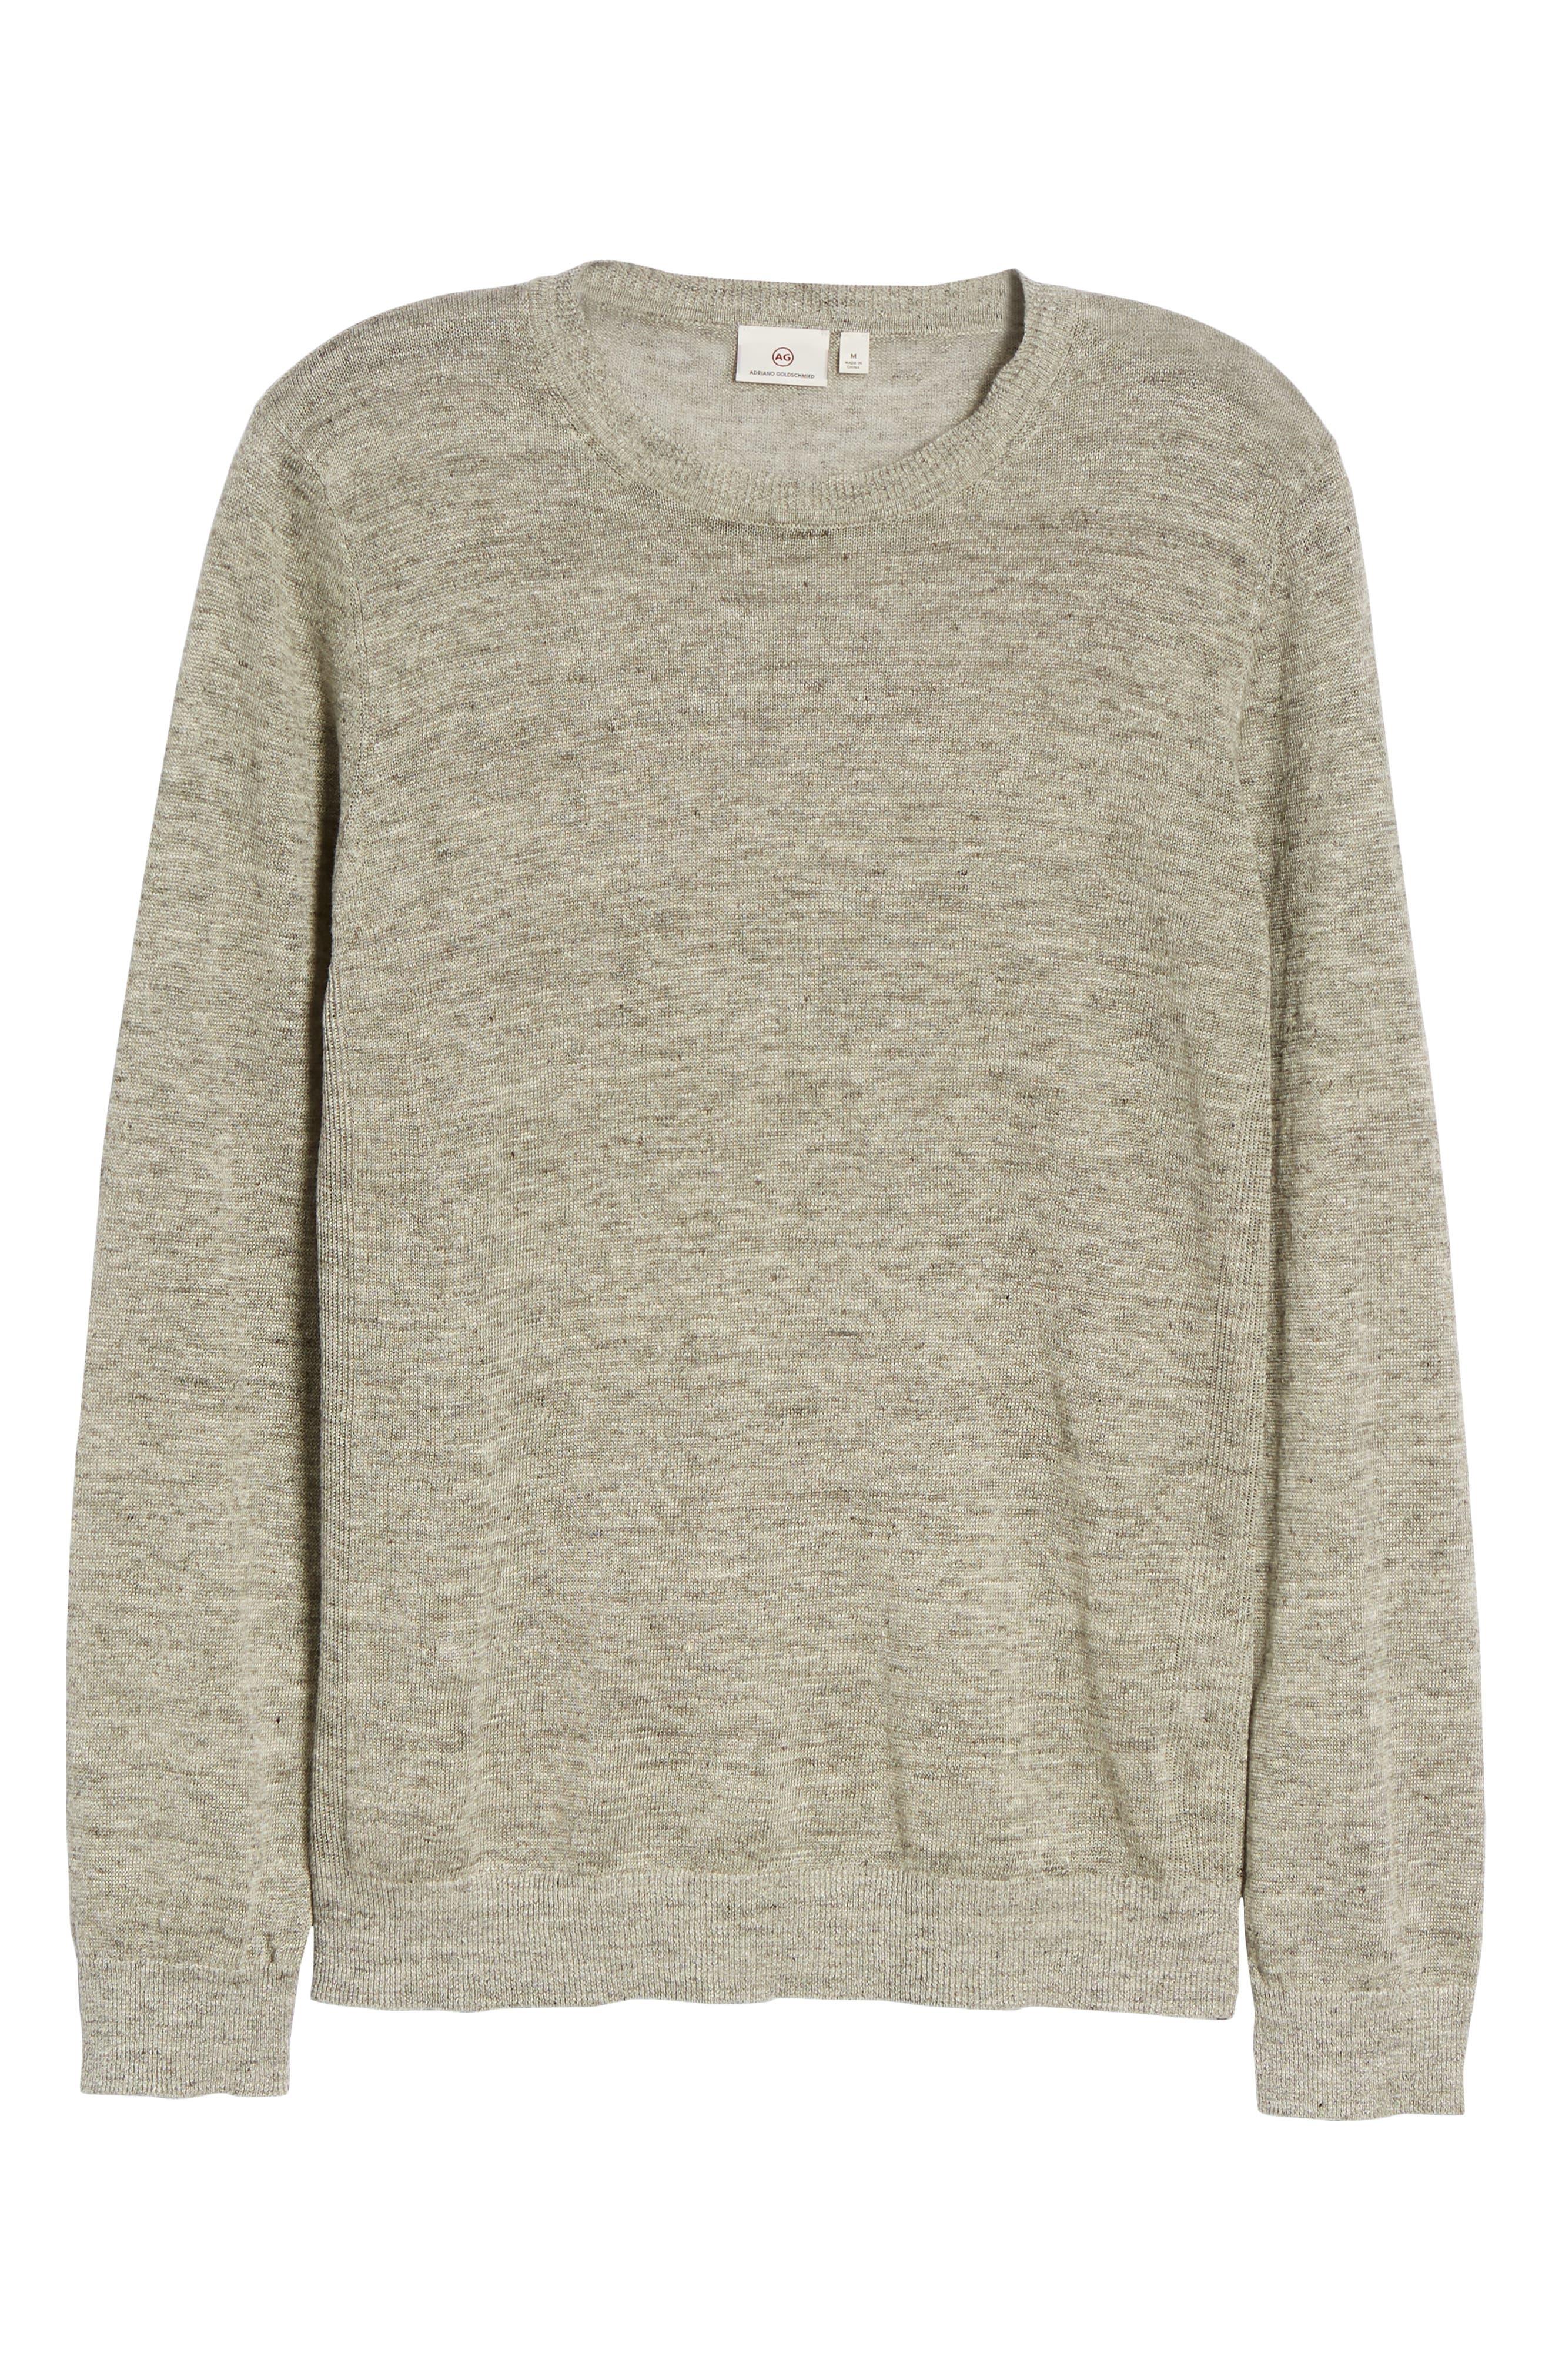 Heyward Long Sleeve T-Shirt,                             Alternate thumbnail 6, color,                             022